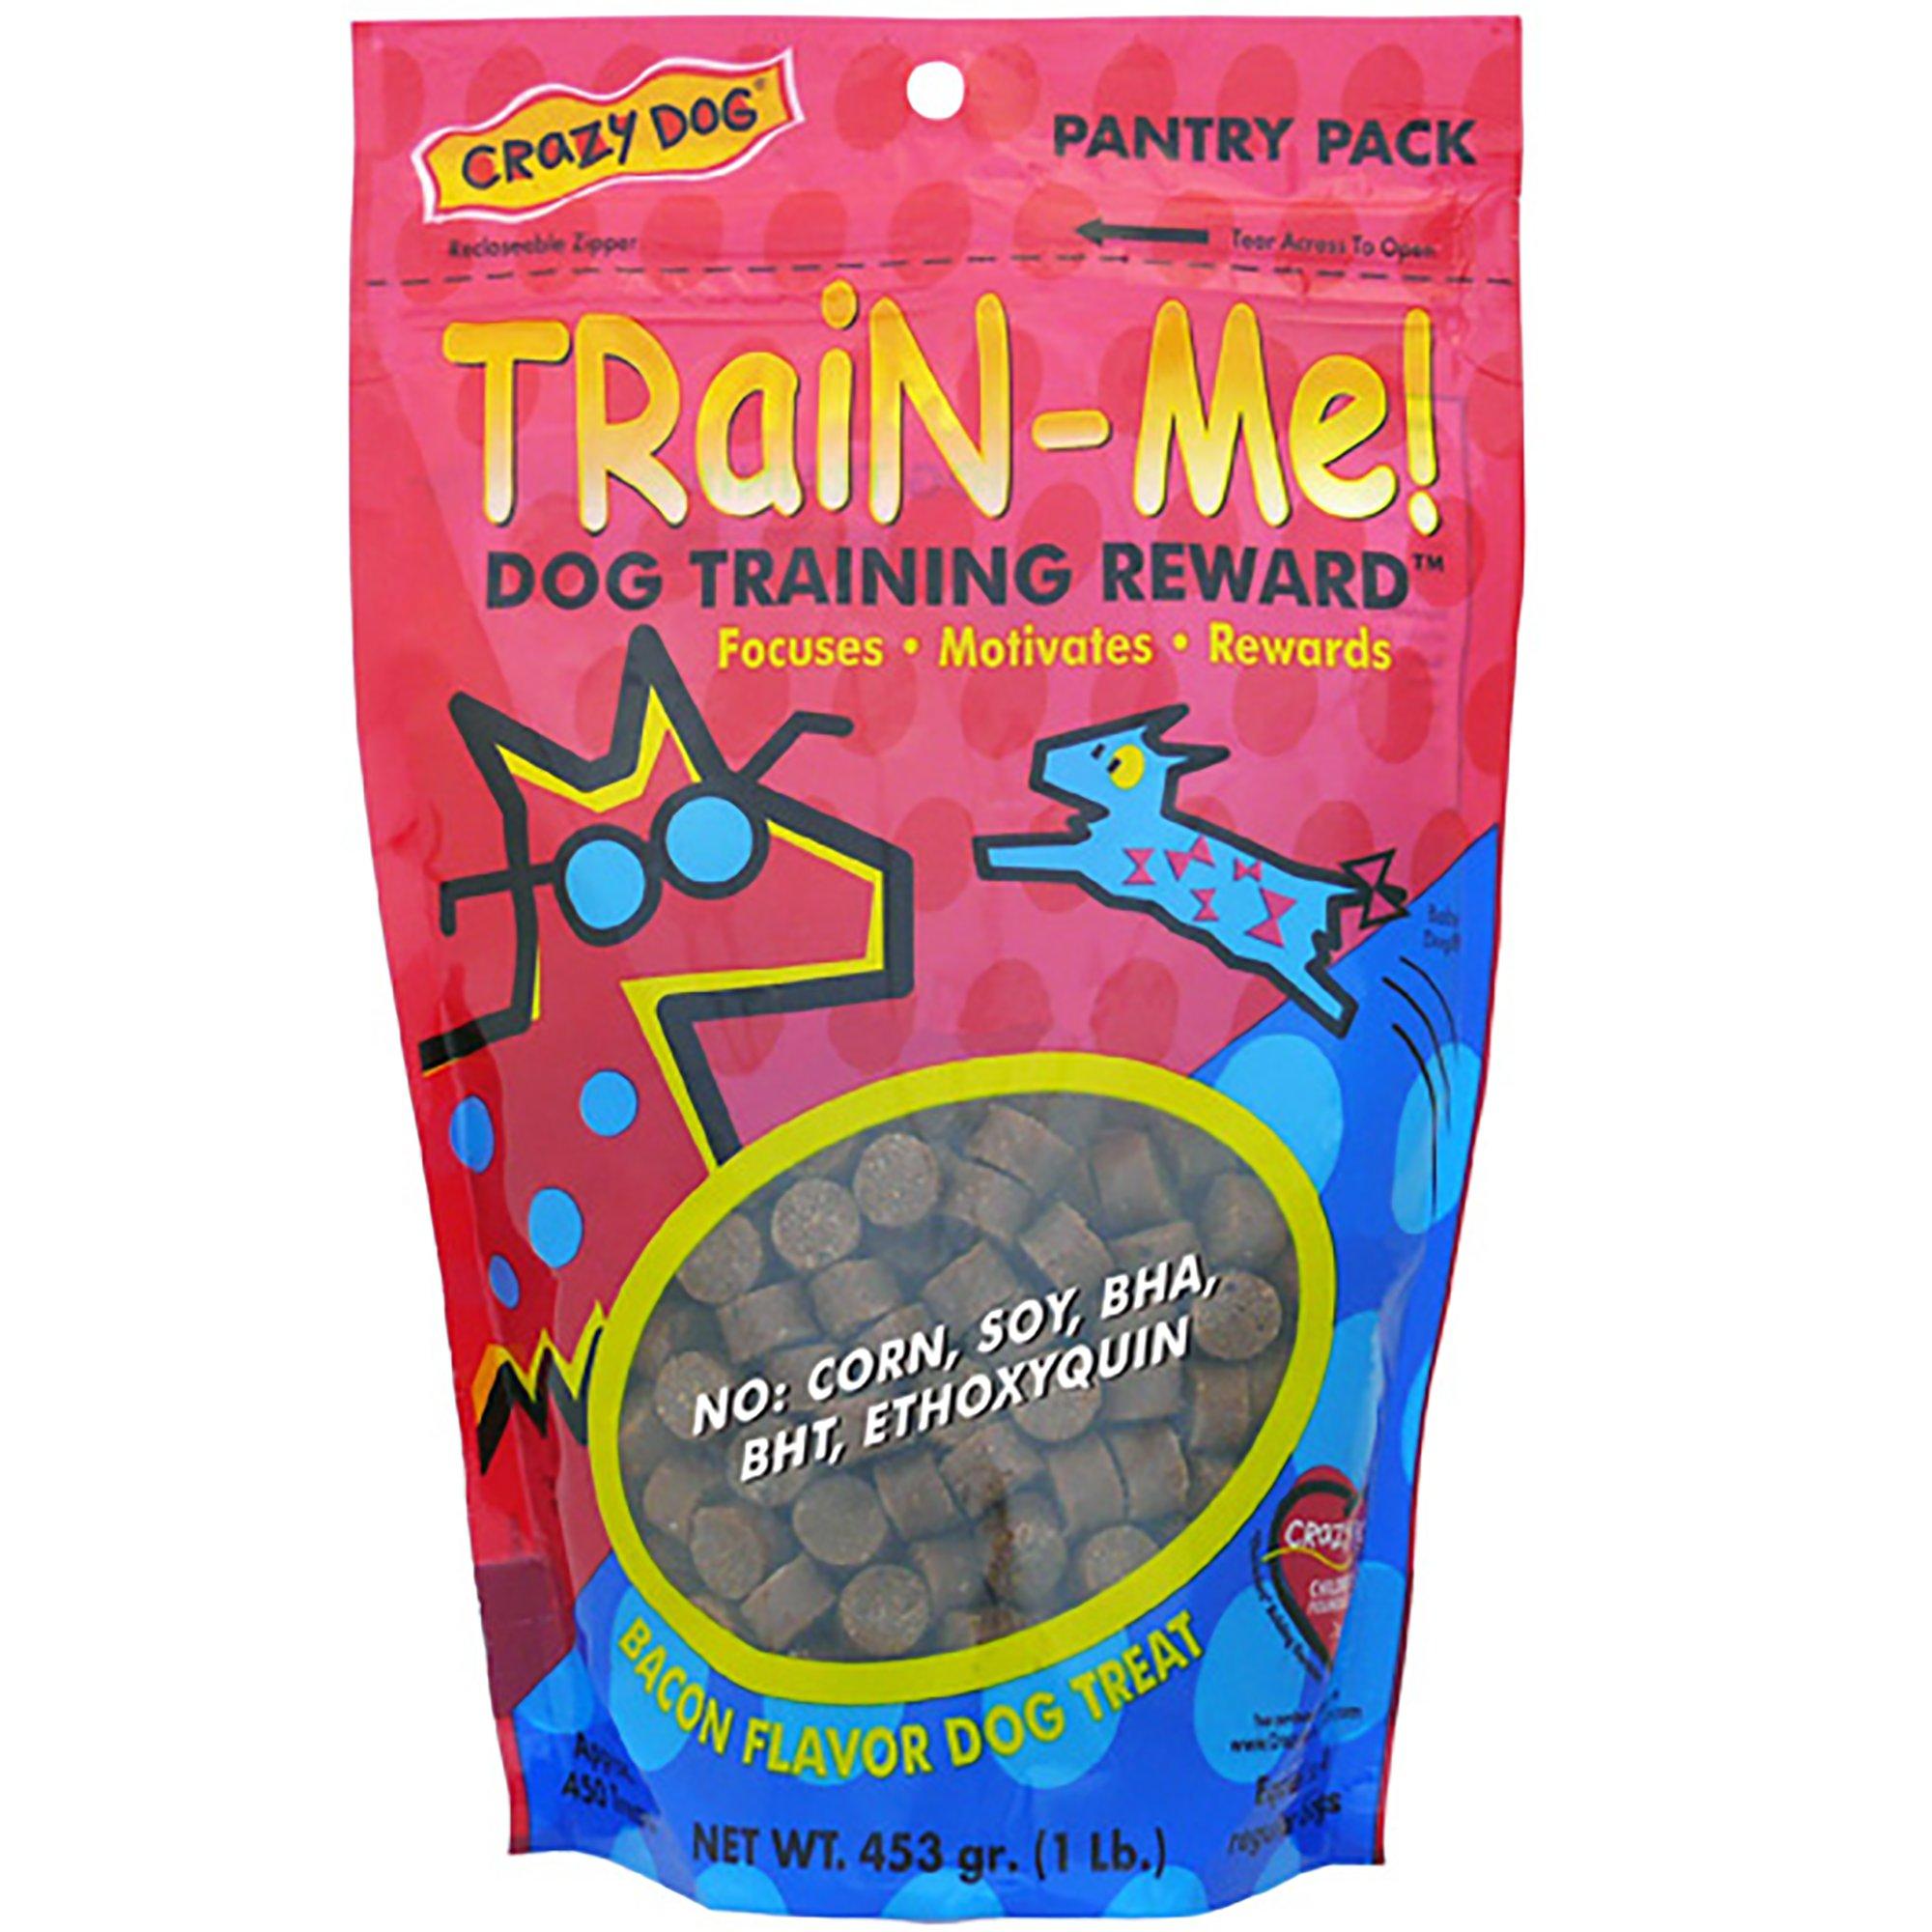 Crazy Dog Train Me Bacon Flavored Training Reward Dog